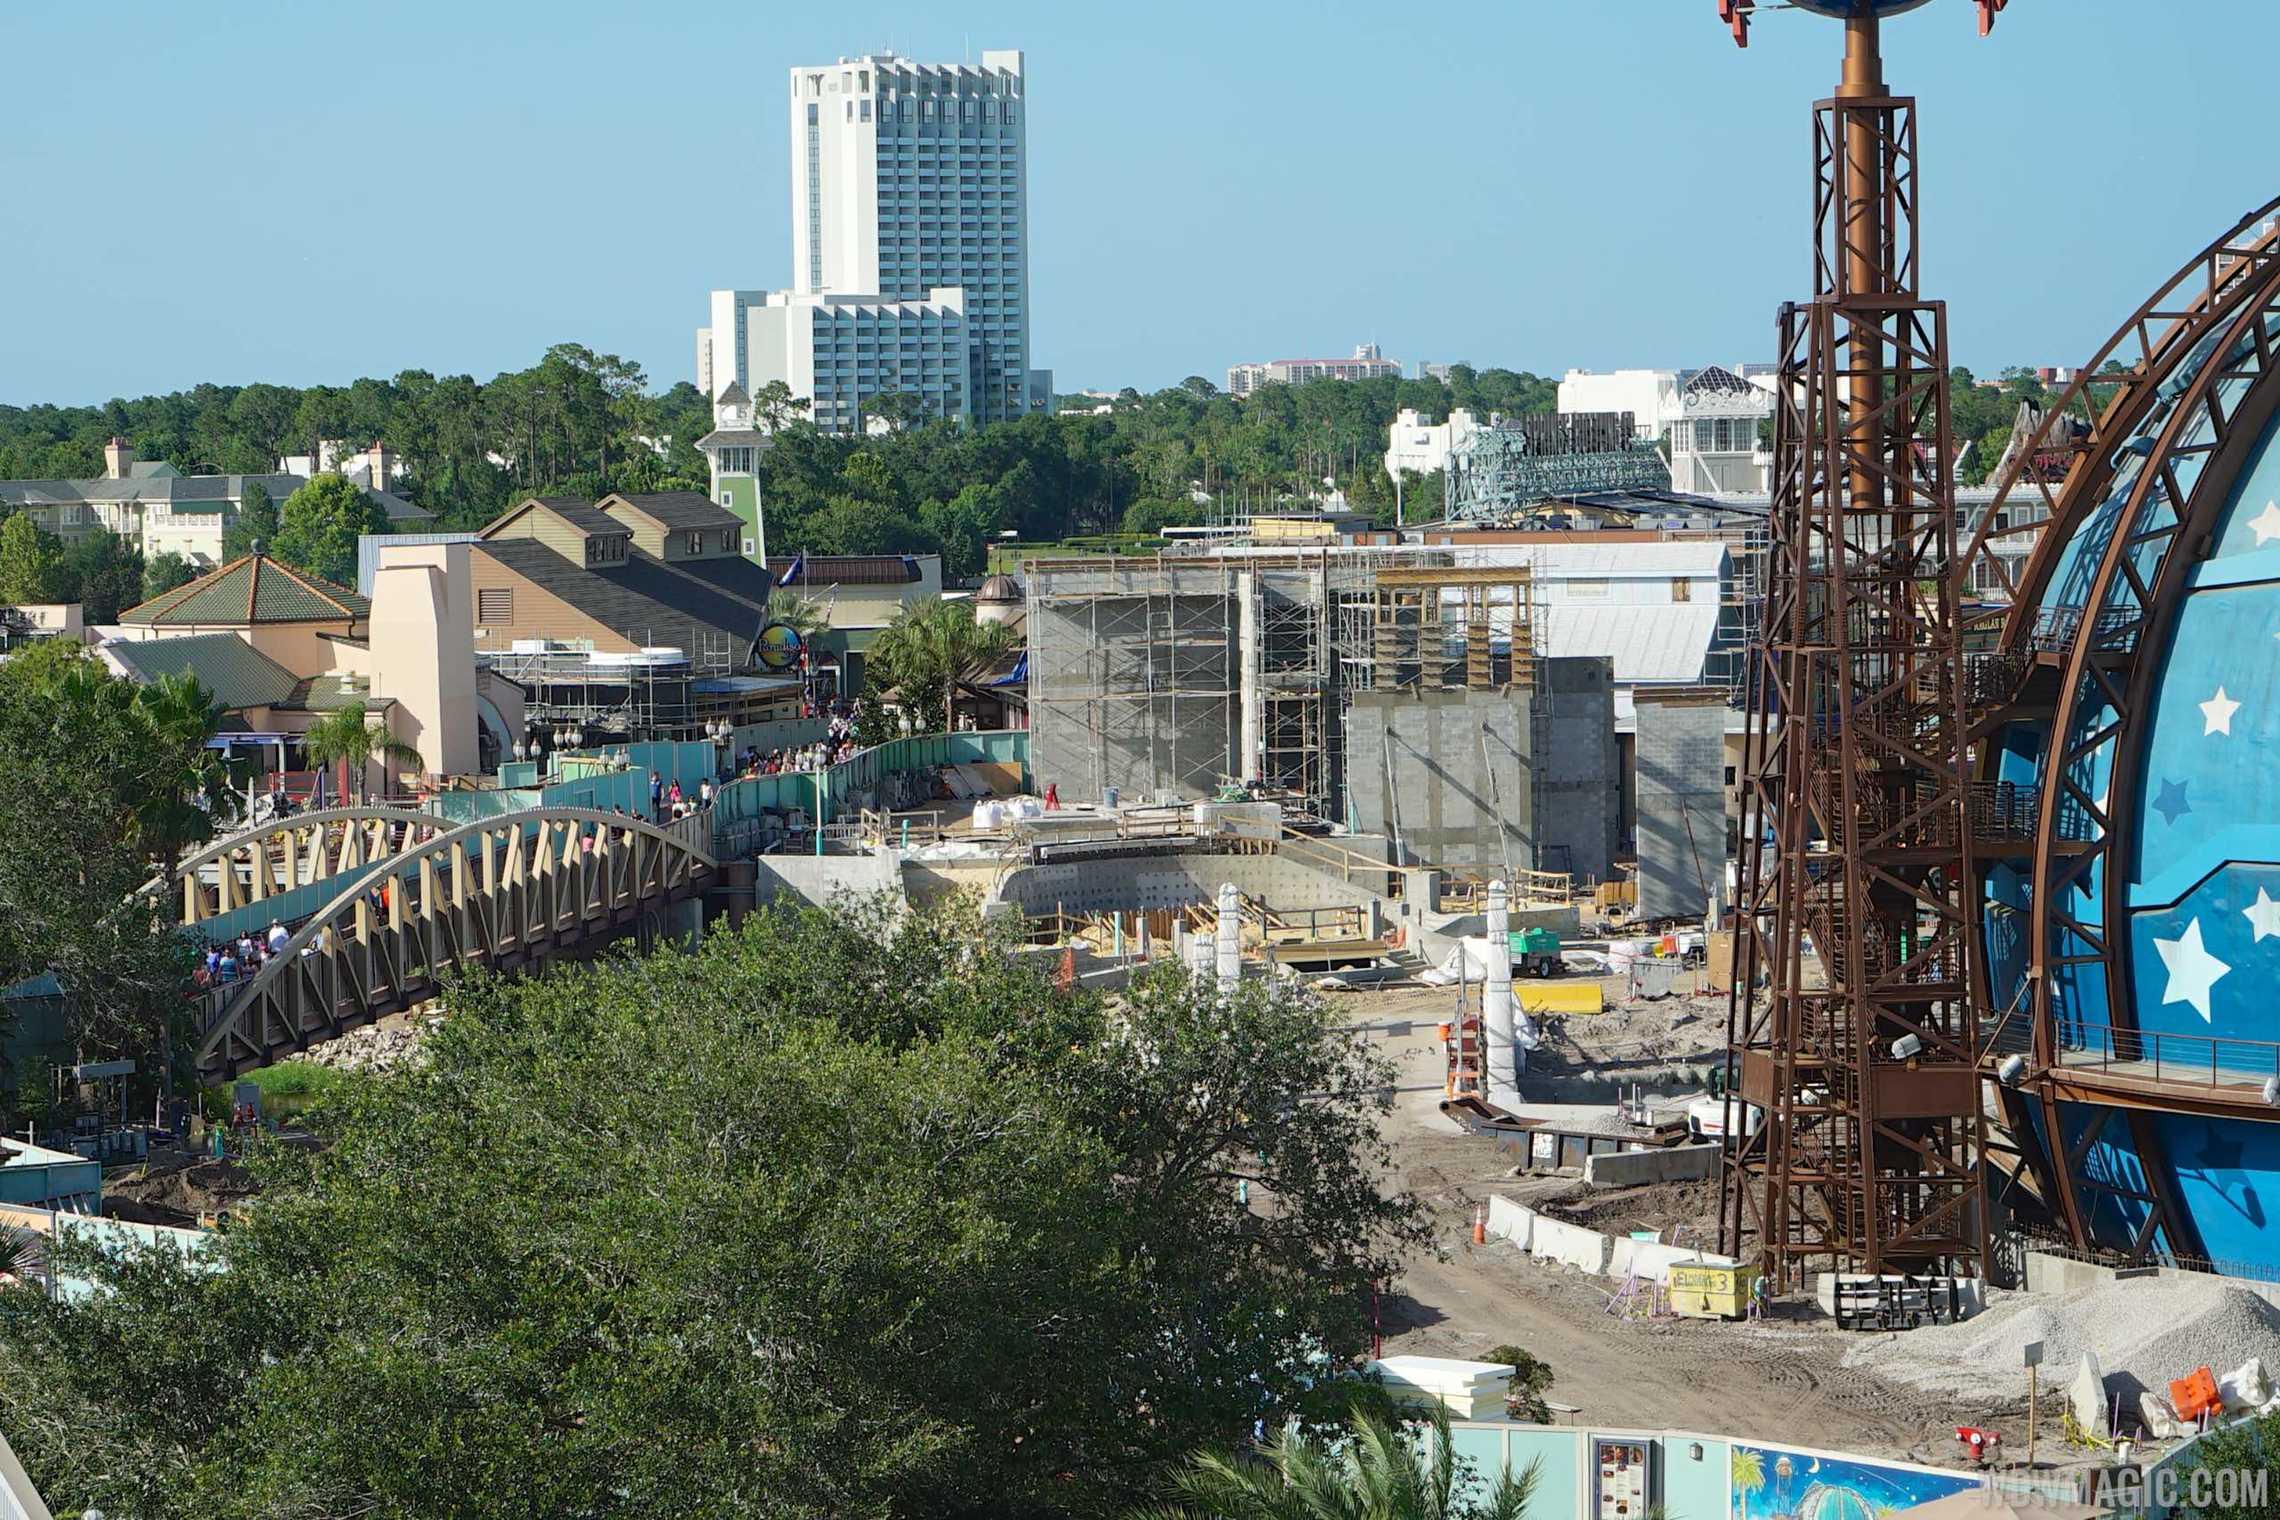 STK Orlando under construction